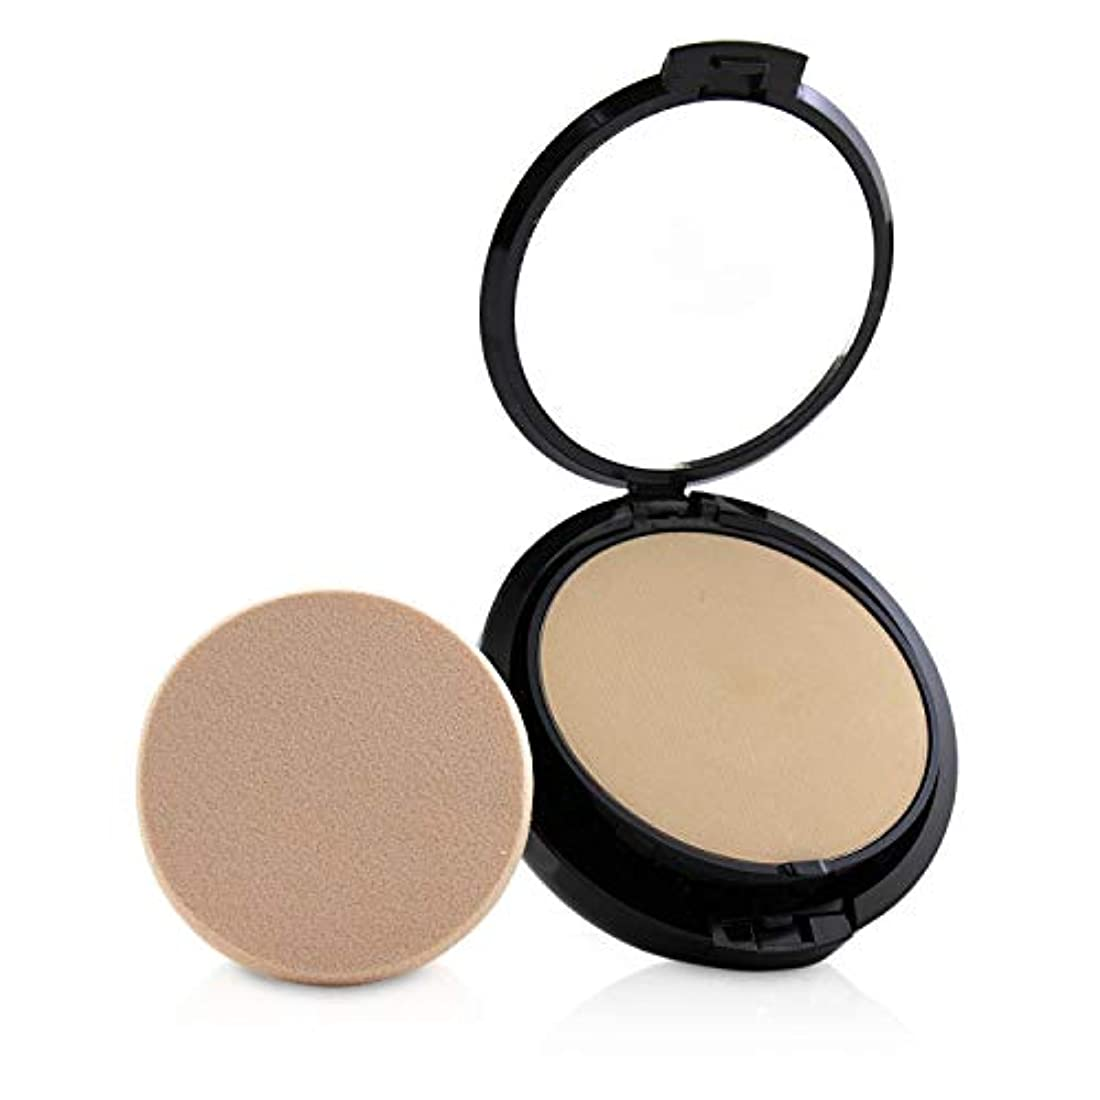 SCOUT Cosmetics Pressed Mineral Powder Foundation SPF 15 - # Shell 15g/0.53oz並行輸入品